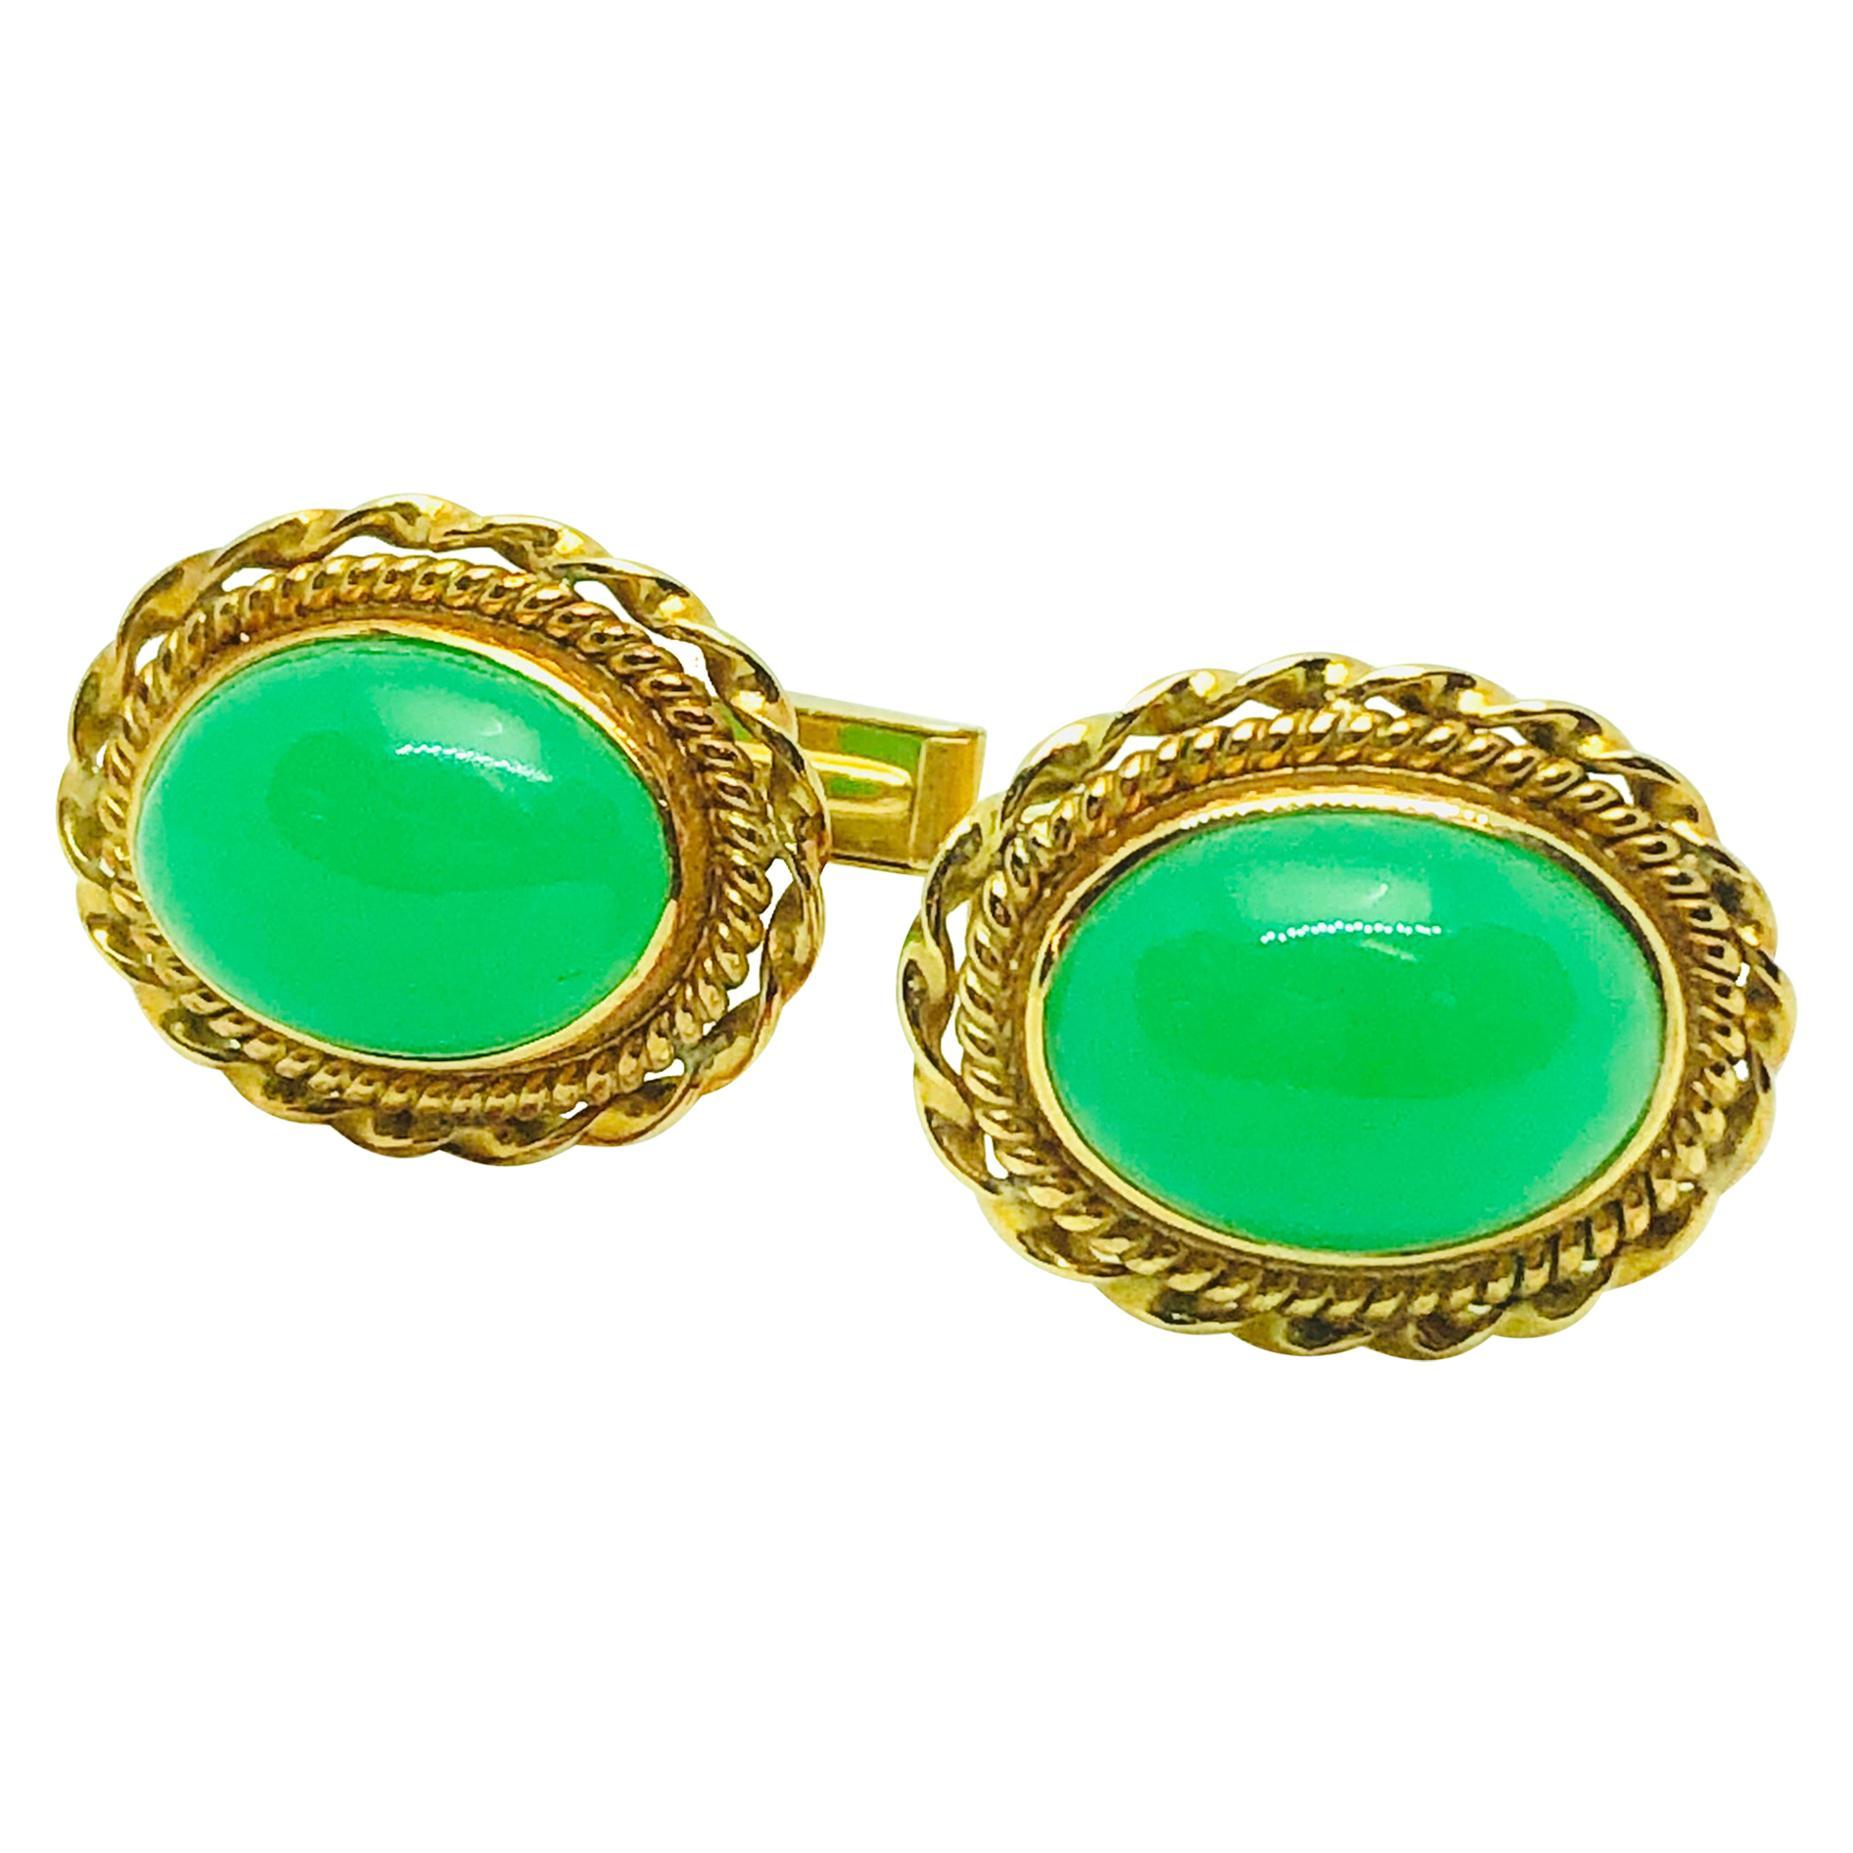 Vintage 14 Karat Yellow Gold and Chalcedony Oval Cufflinks